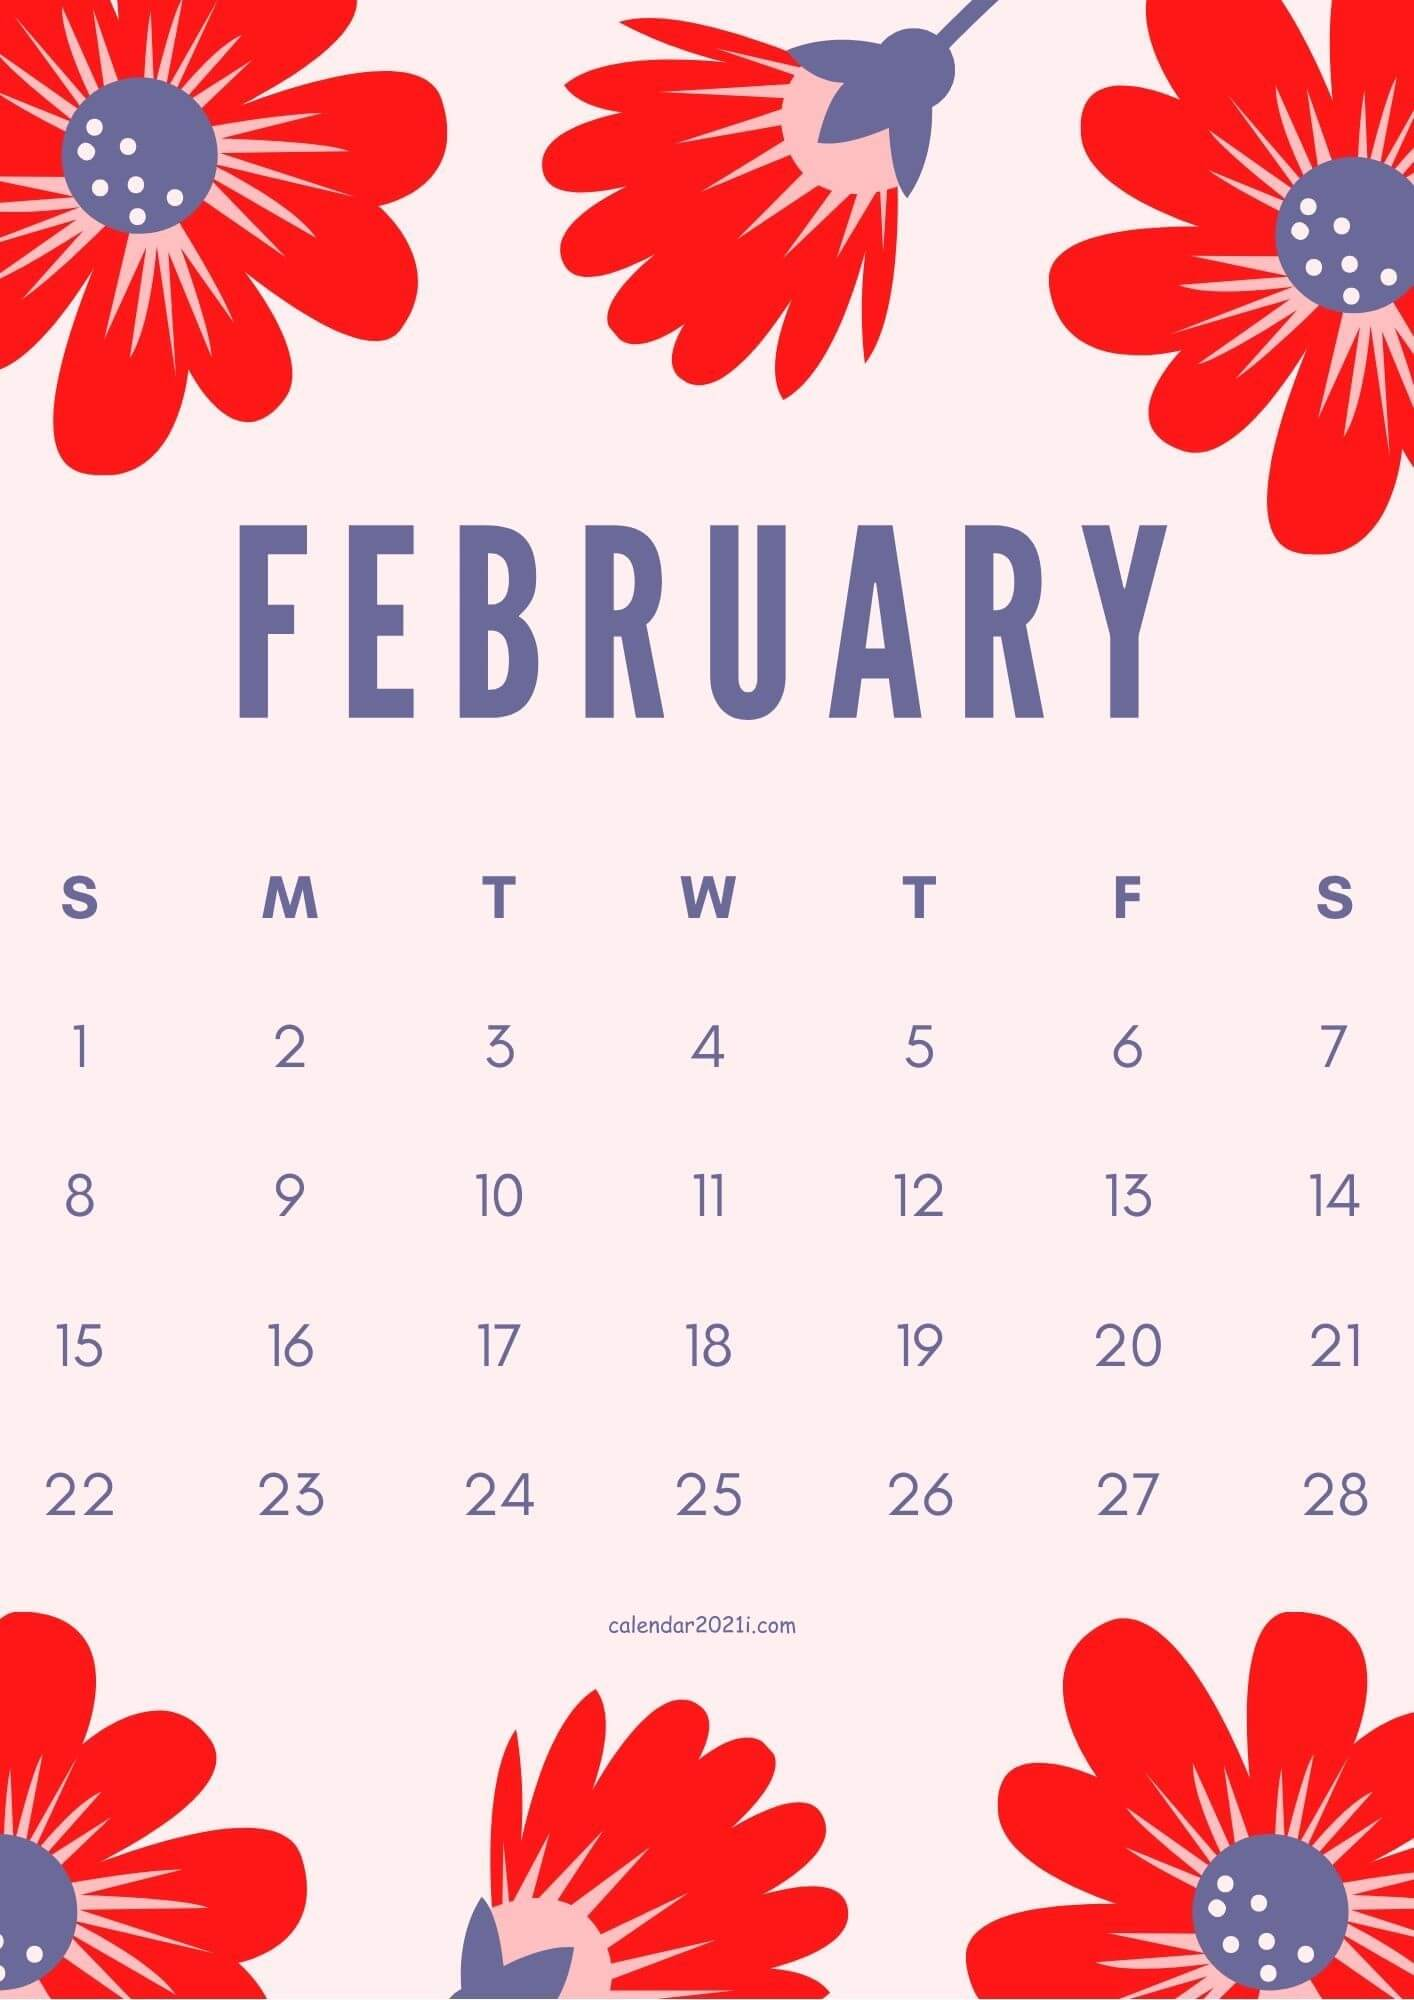 Floral February 2021 Wall Calendar